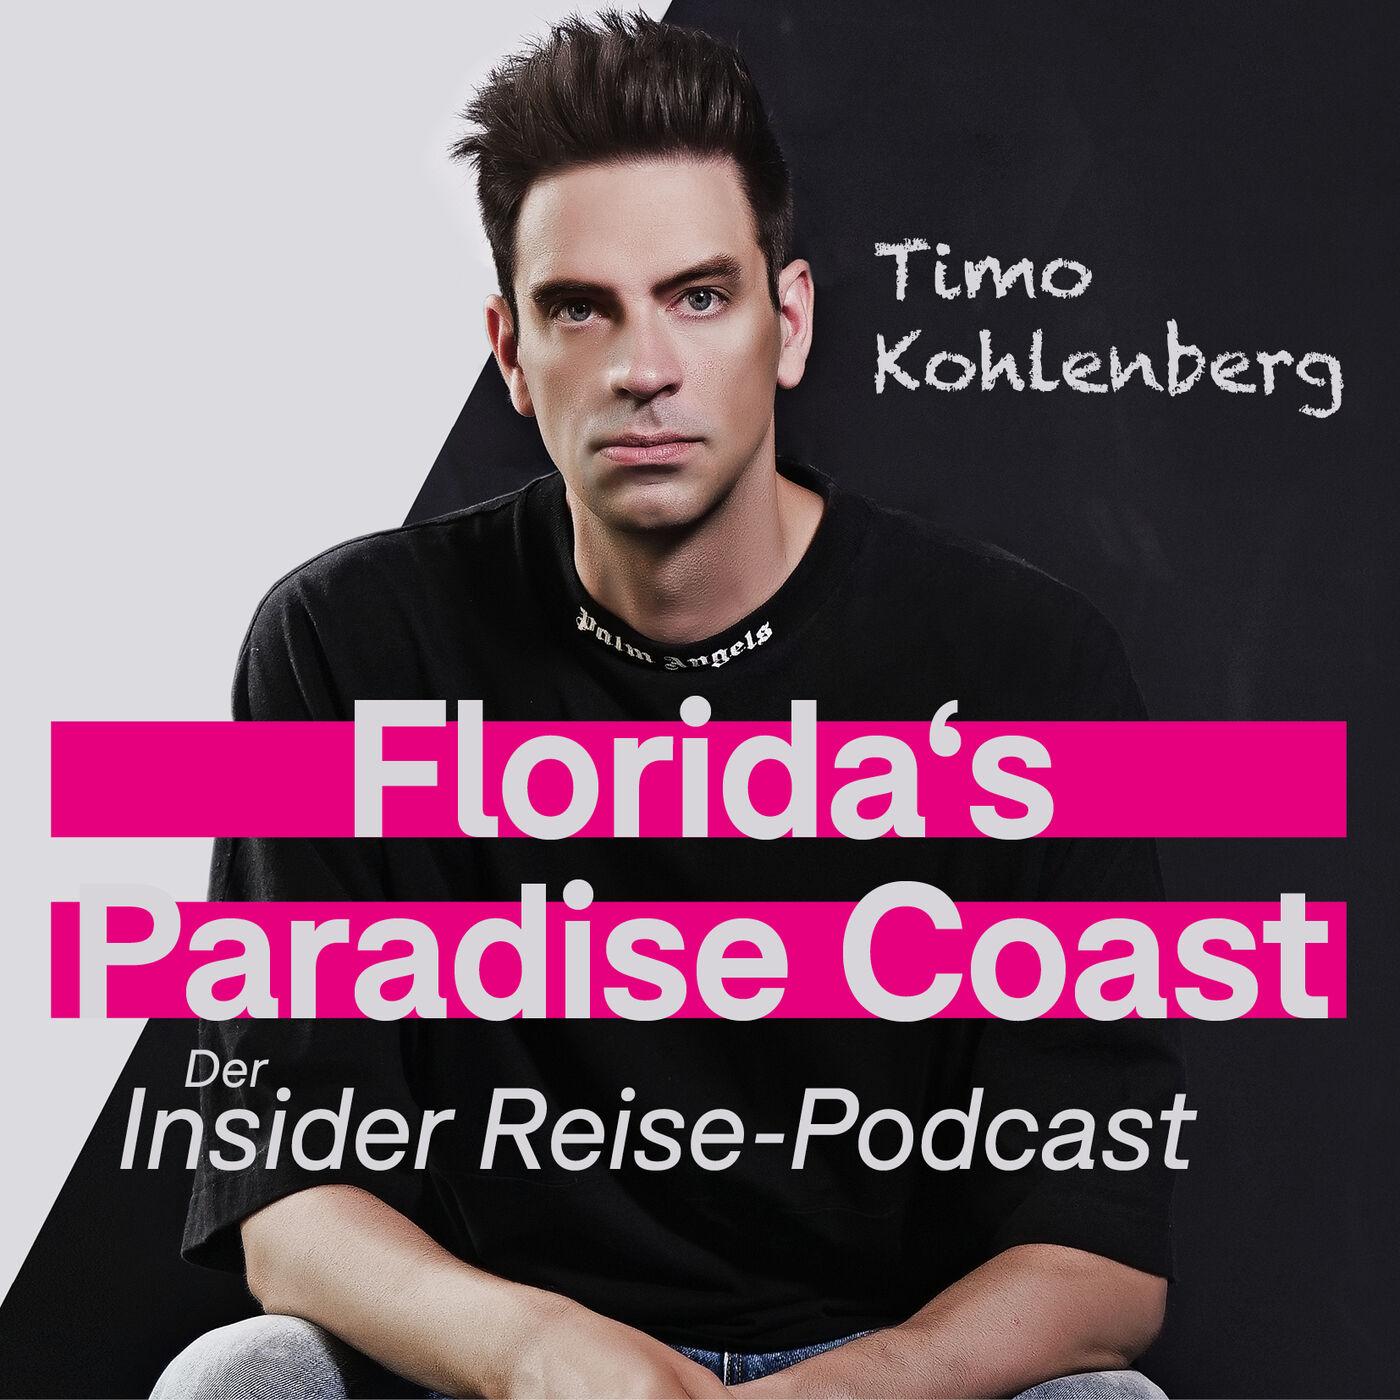 Florida's Paradise Coast: Mit Alligatoren auf Kuschelkurs | Insider Reise Podcast Timo Kohlenberg